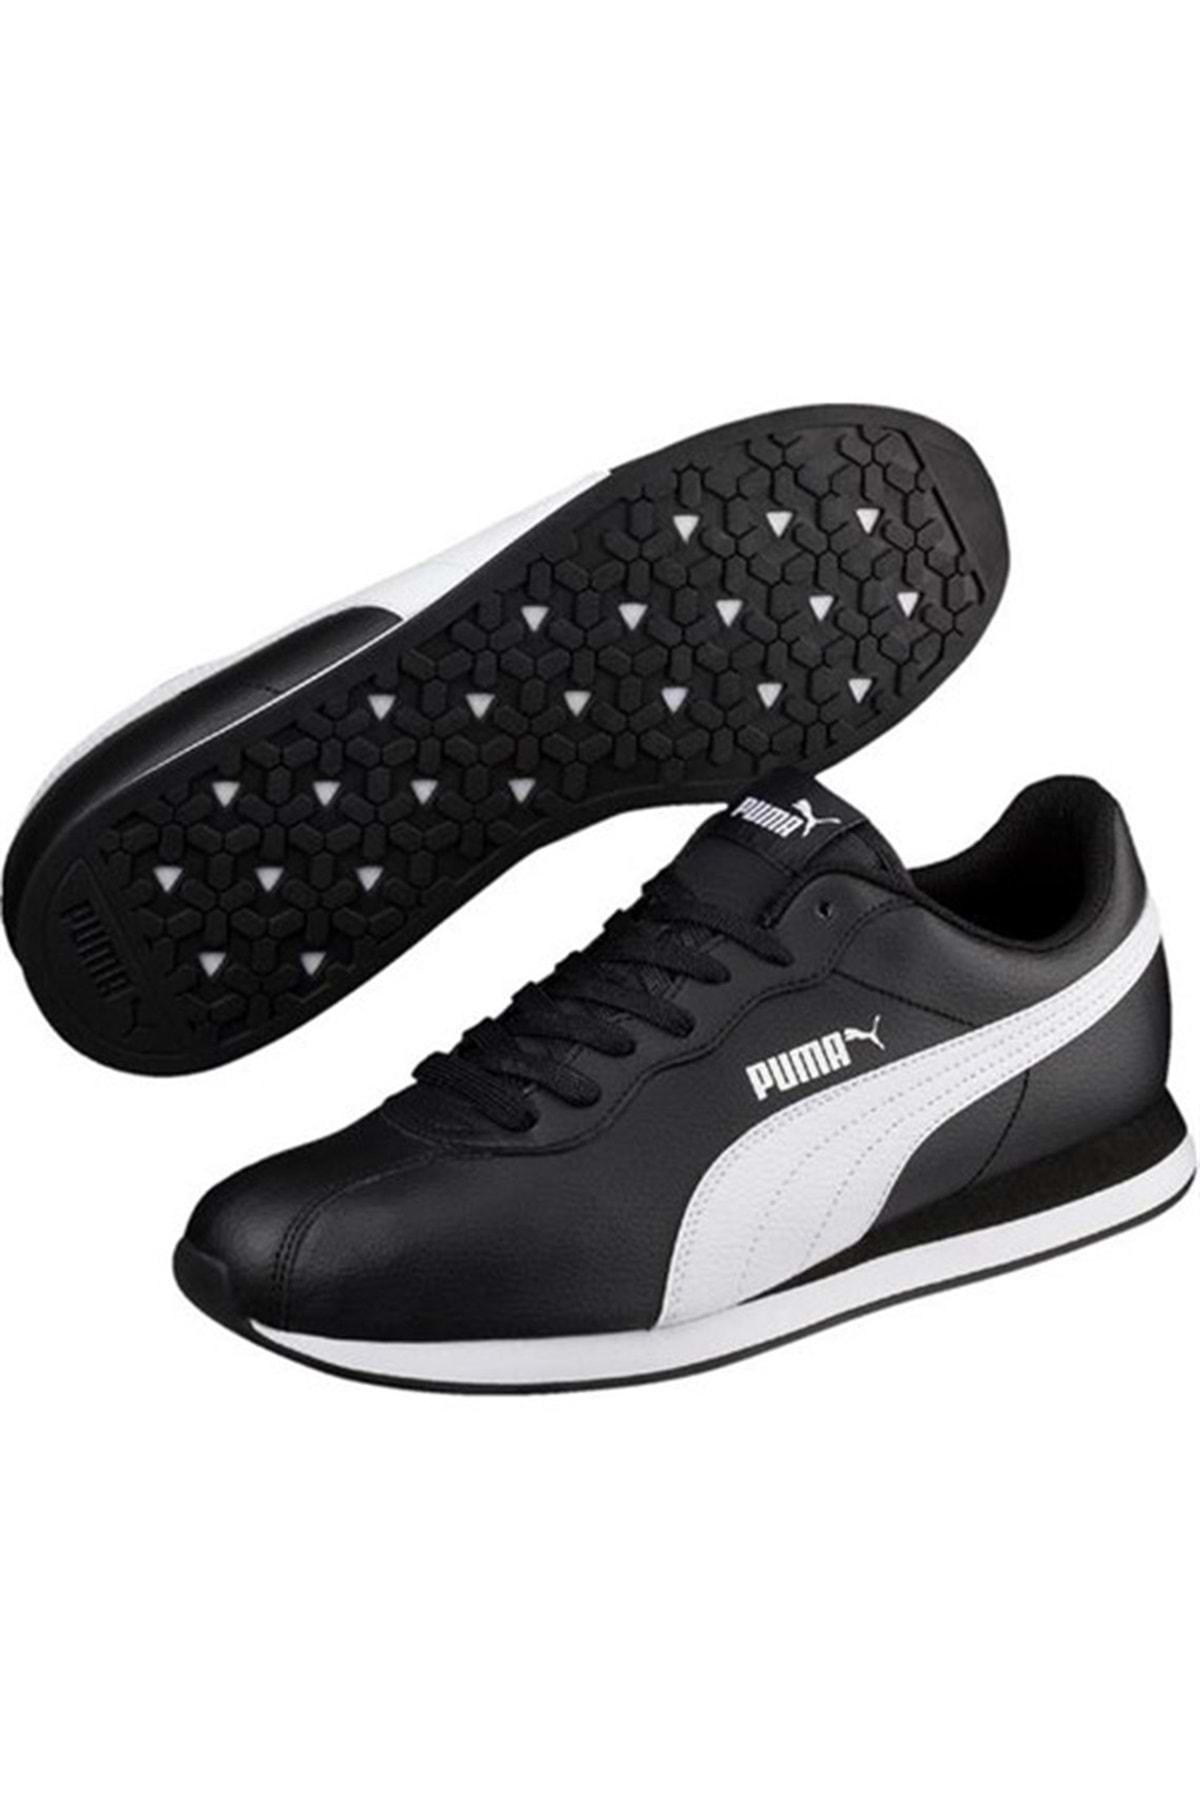 Puma Siyah Erkek Çocuk Sneaker Ayakkabı TURIN II J 1